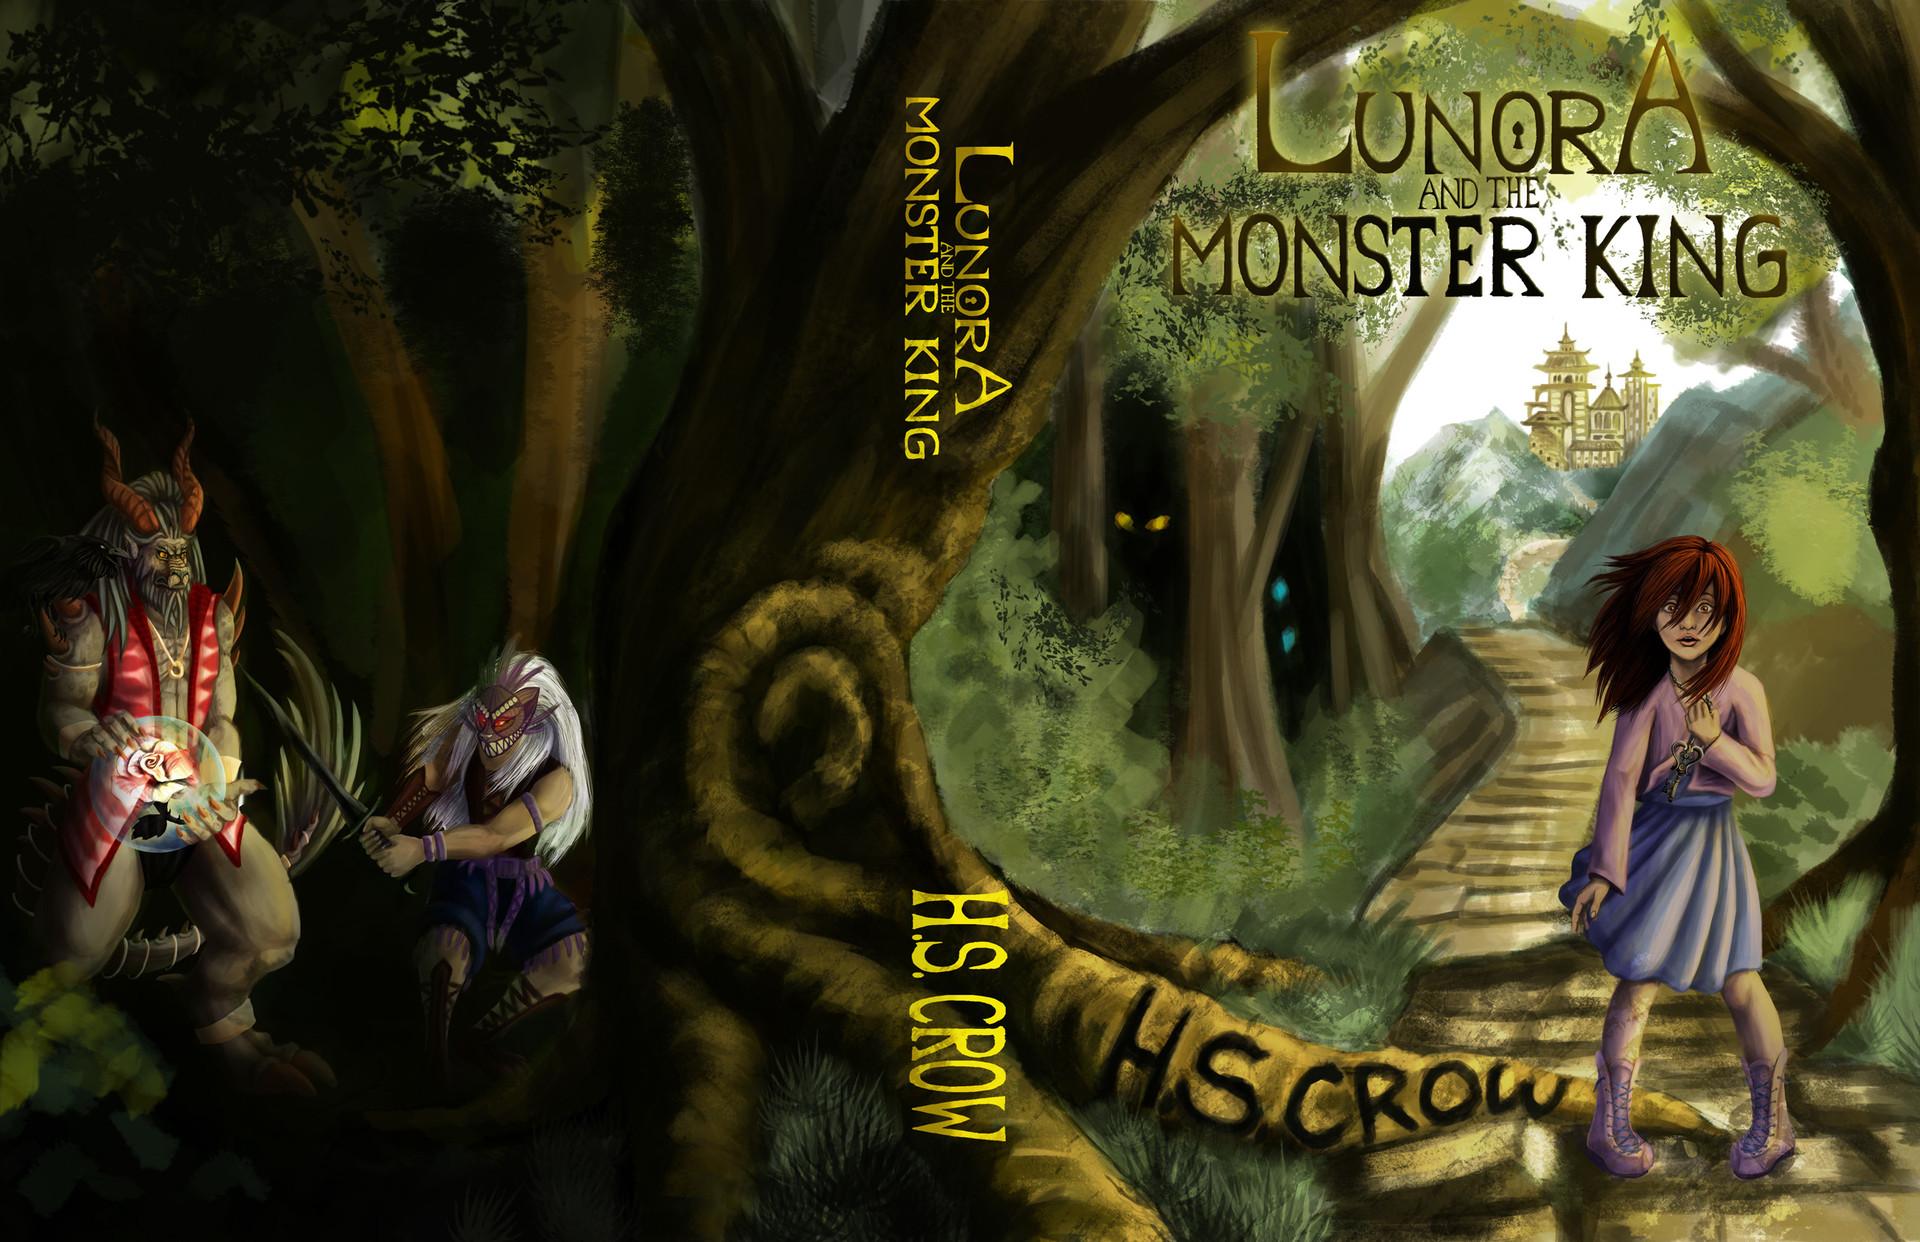 artstation lunora and the monster king book cover sierra ashe